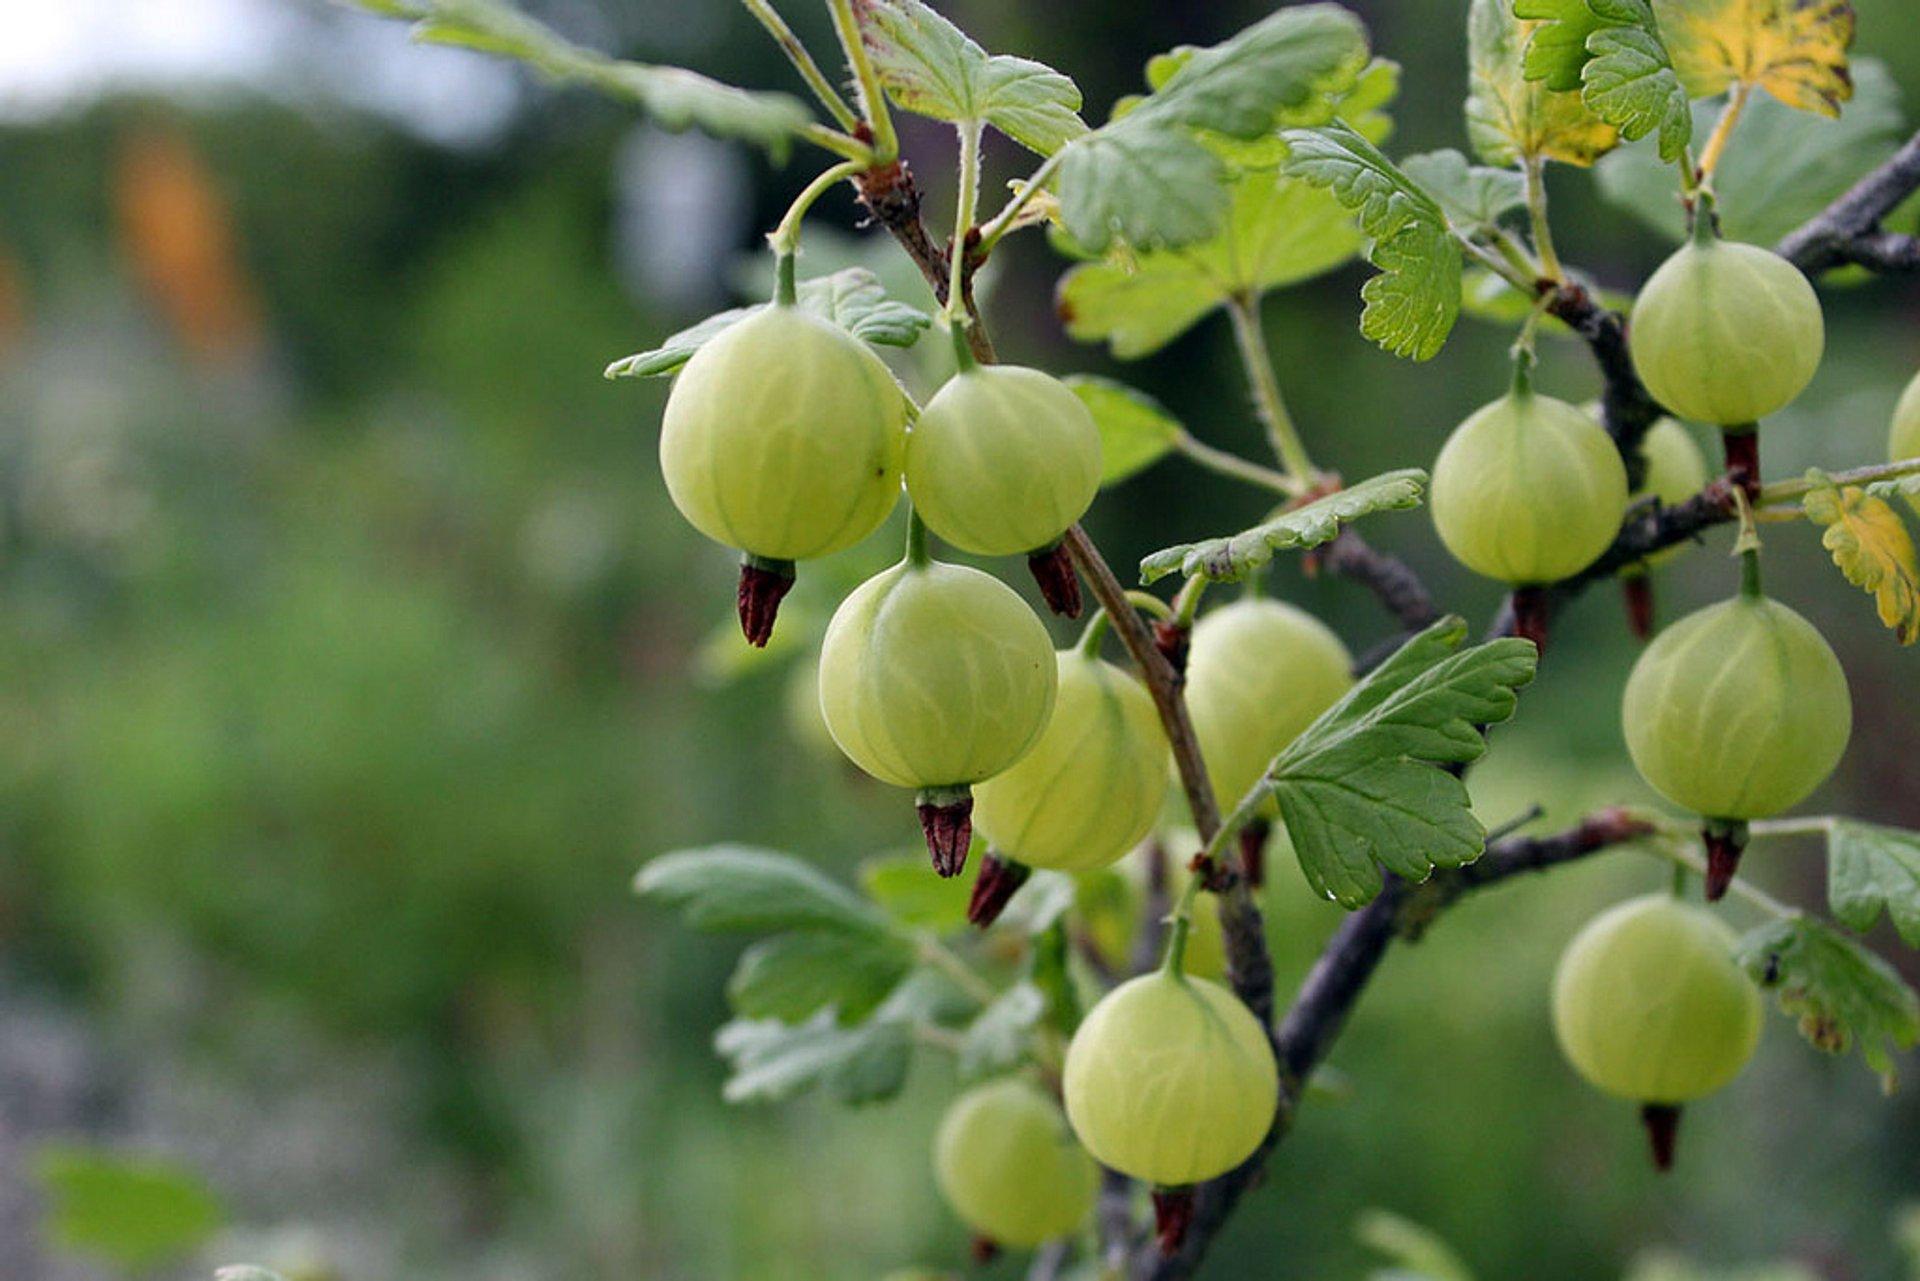 Berry Season in Wales 2020 - Best Time